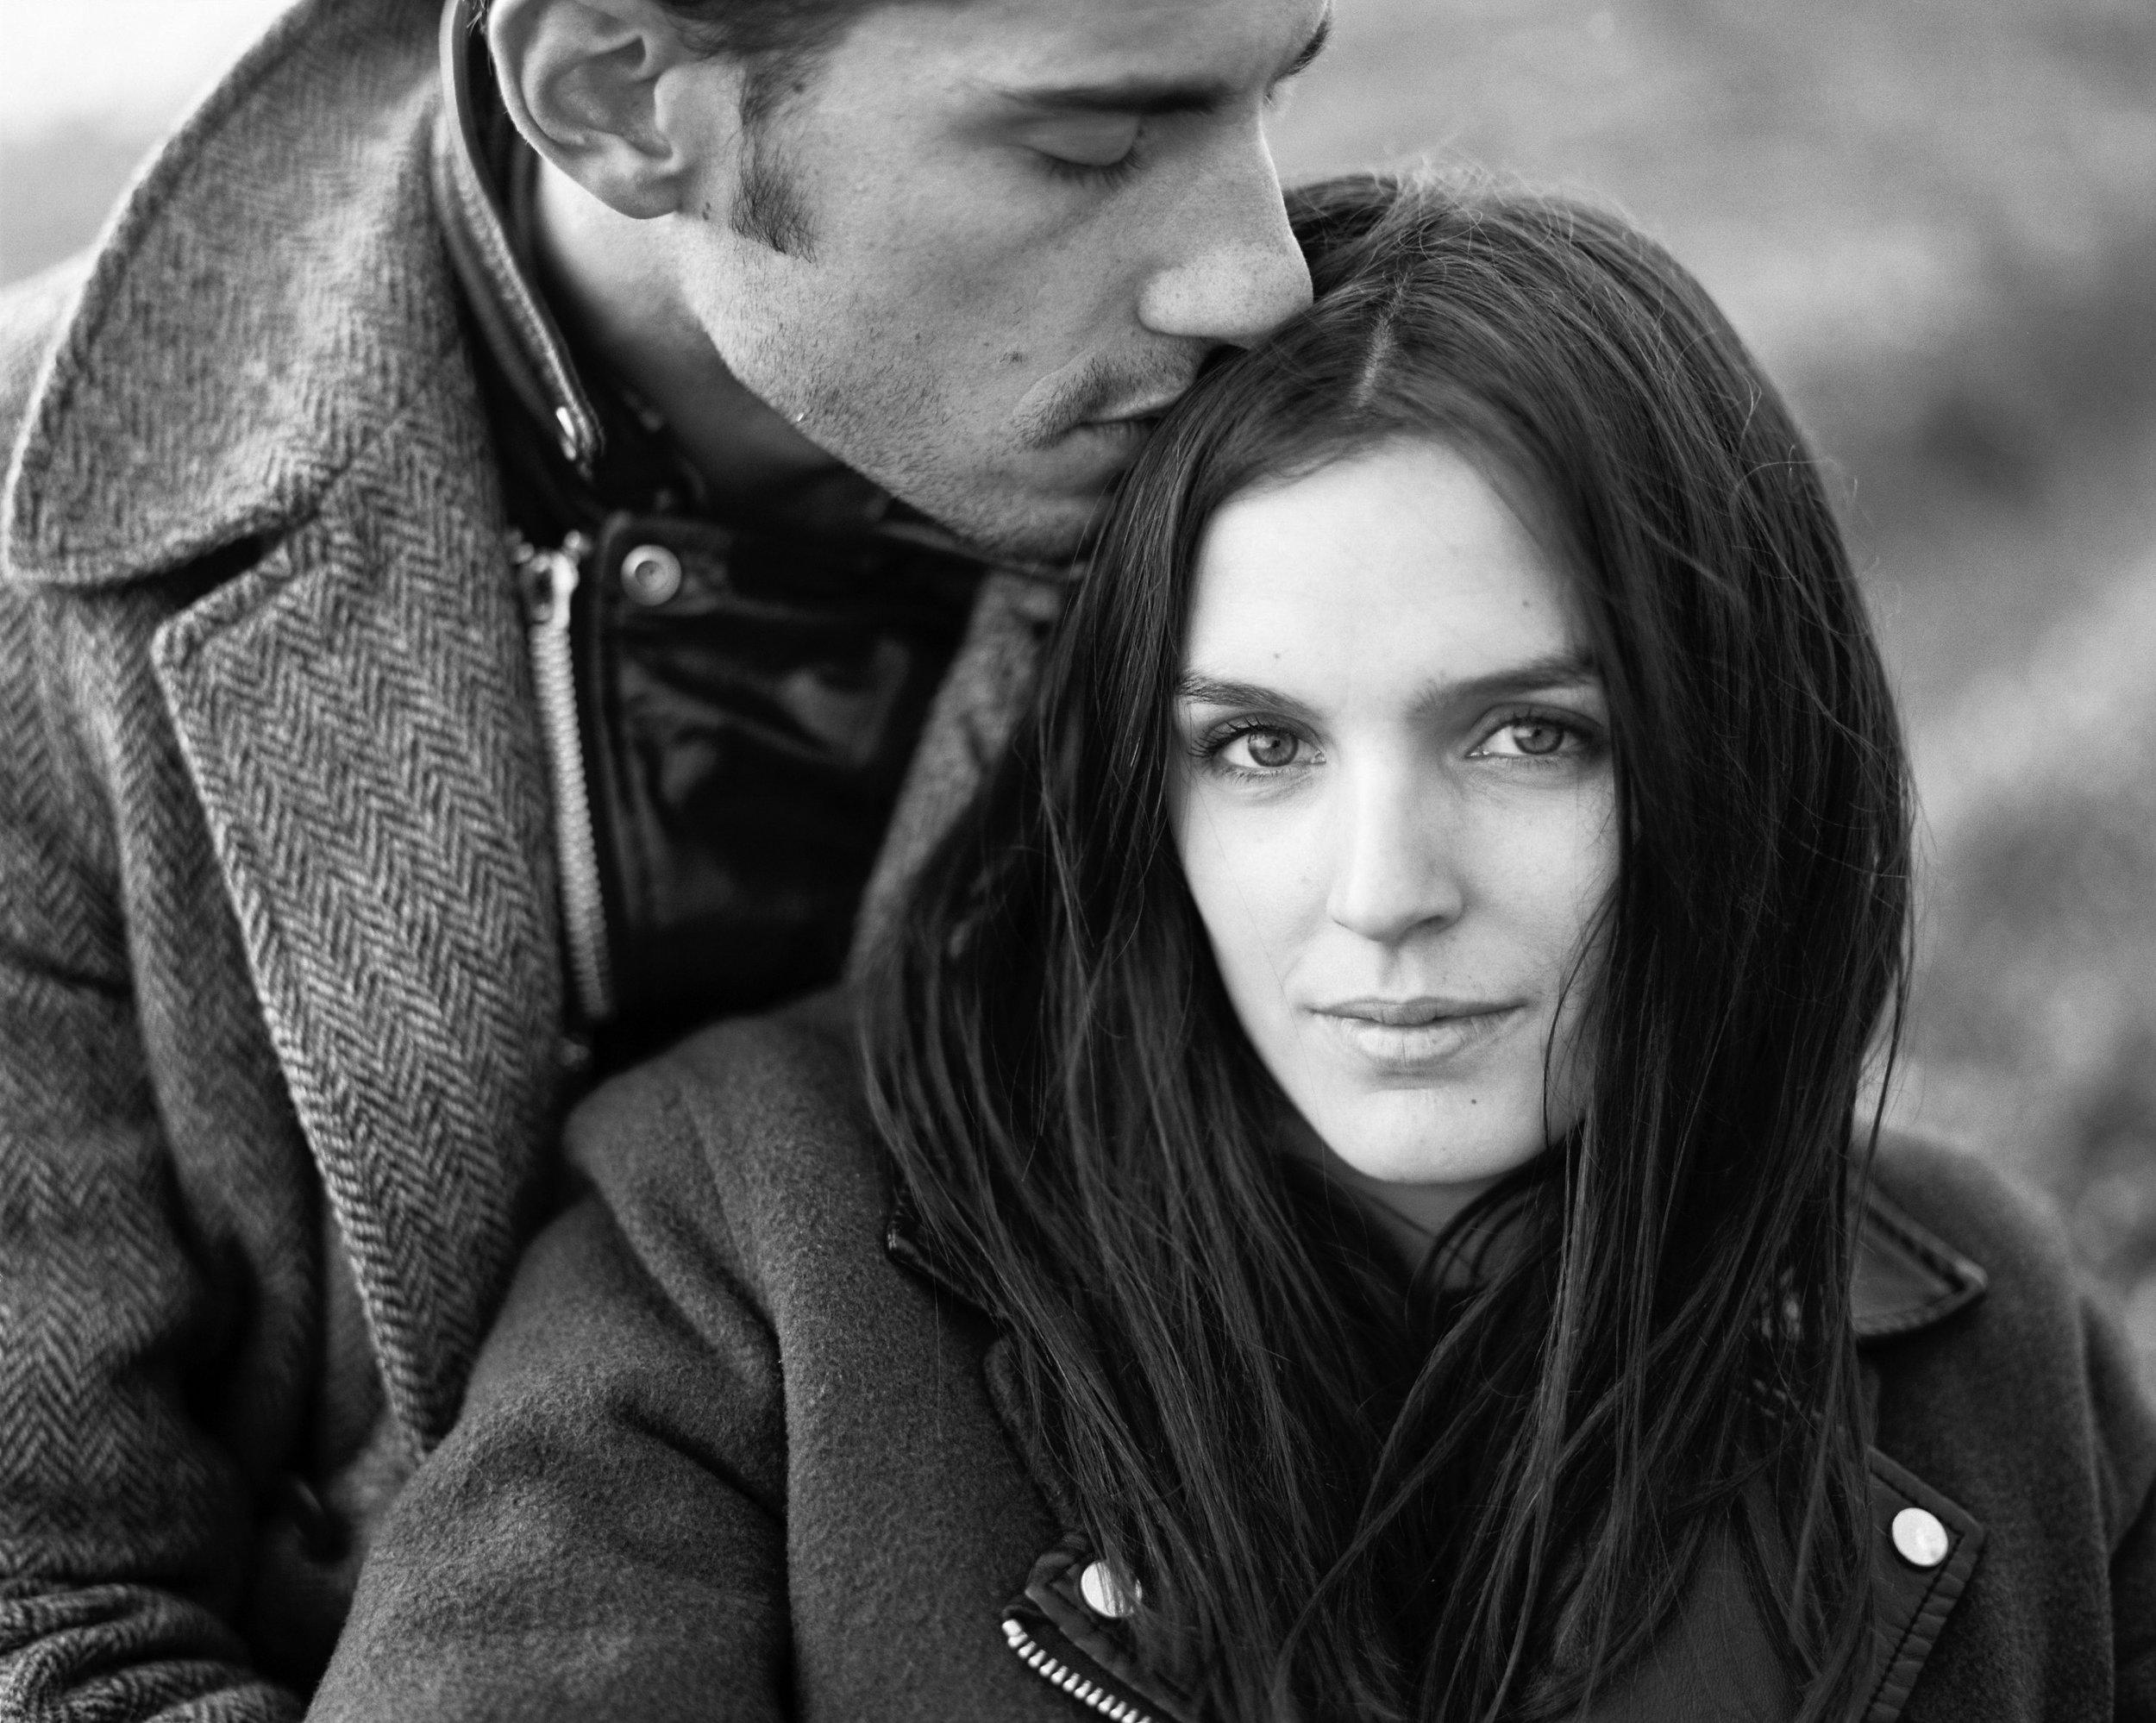 celinehamelin-photographe-couple-argentique-loversession-grece-santorin-argentique-filmphotography-greece15.jpg